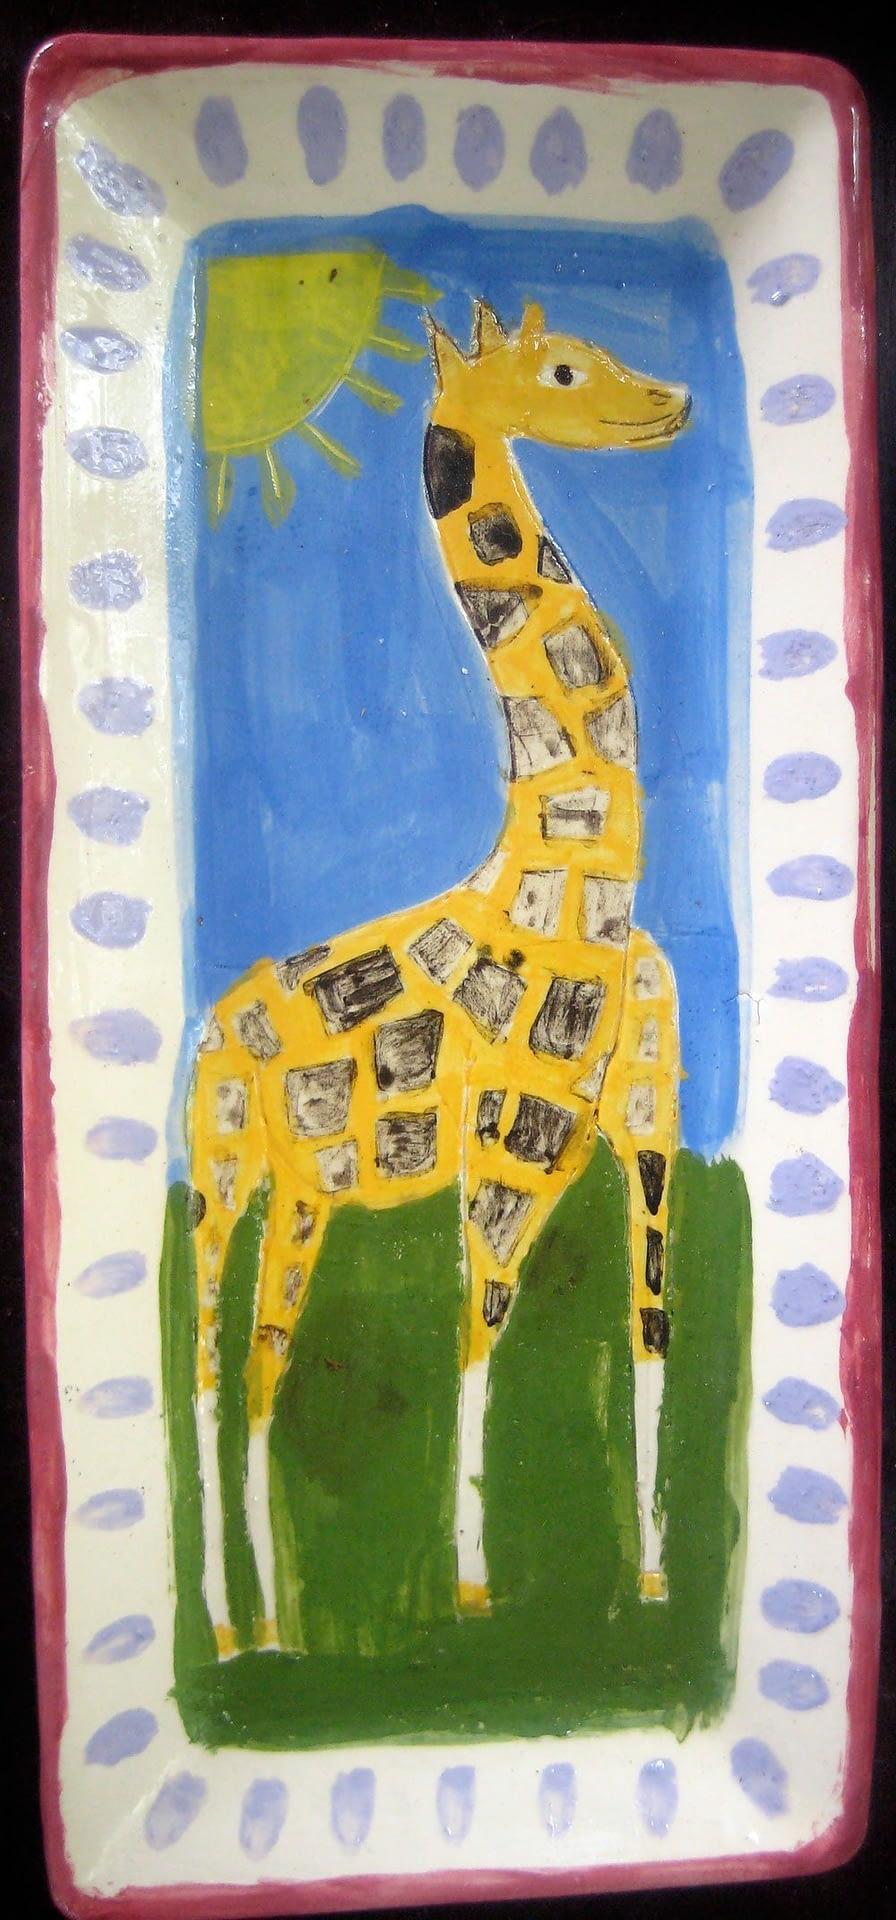 Giraffe Plate Ceramic art zion levy stewart